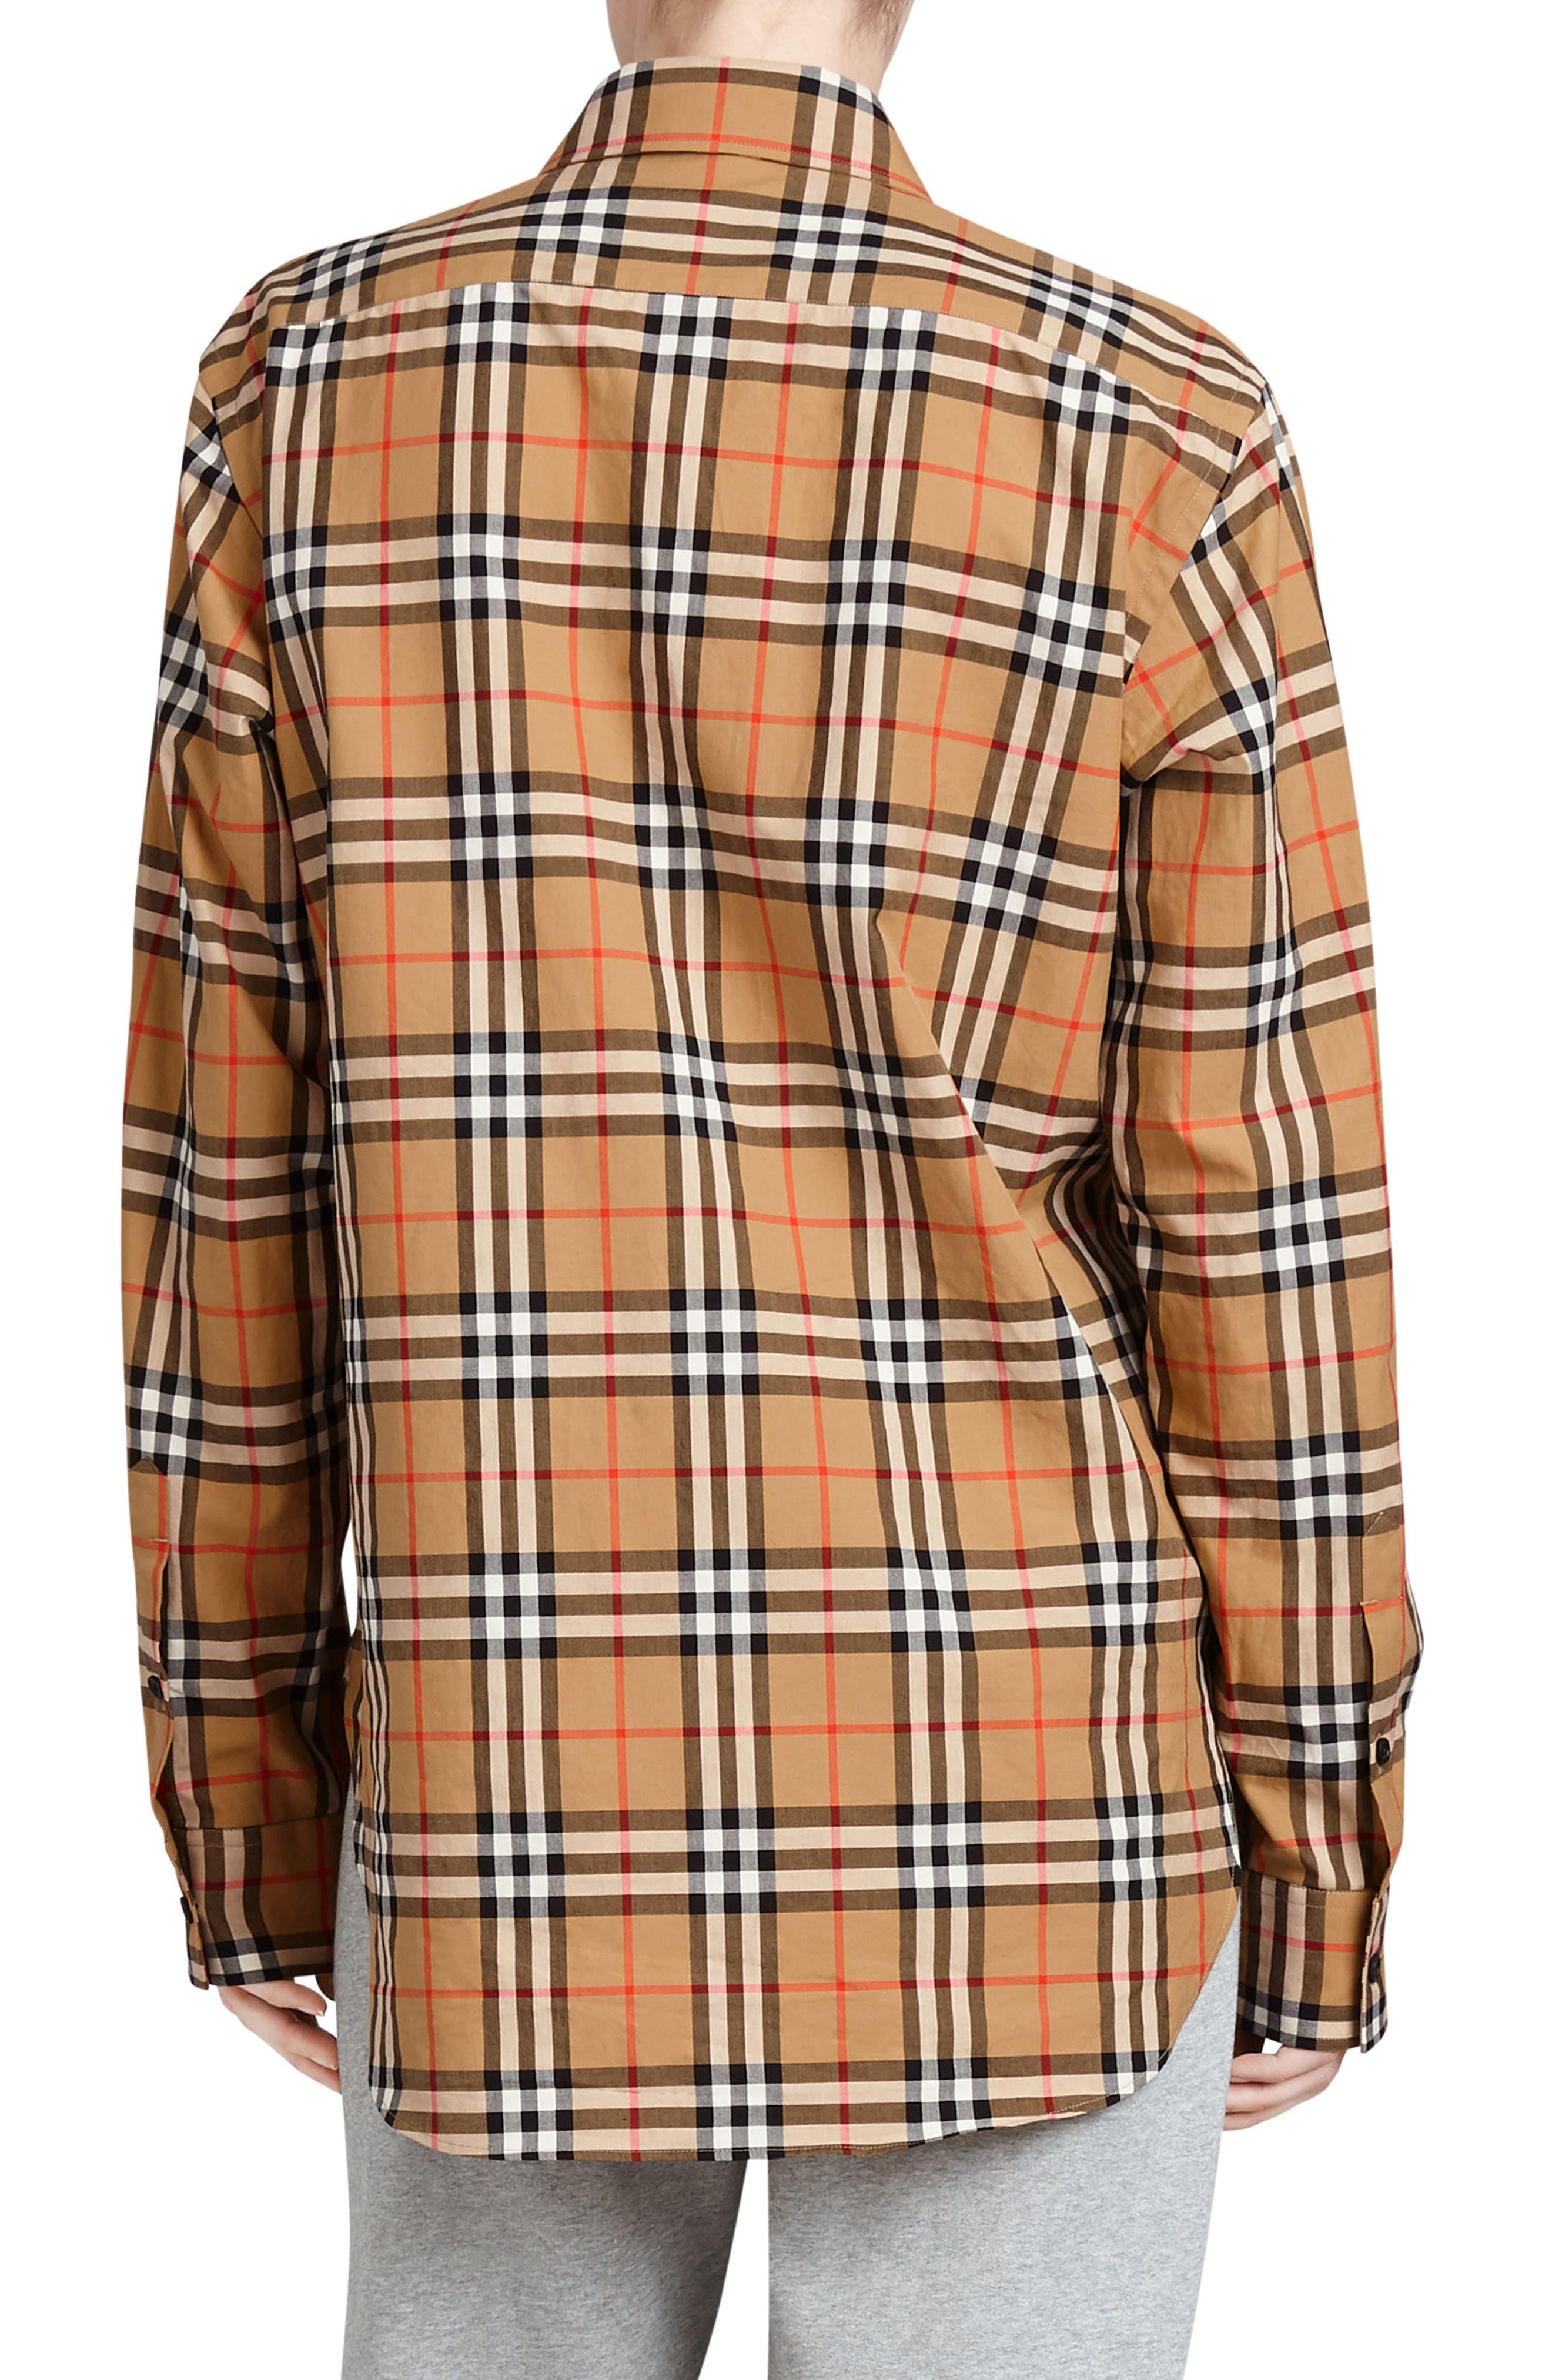 BURBERRY,                             Rainbow Check Shirt,                             Alternate thumbnail 2, color,                             254